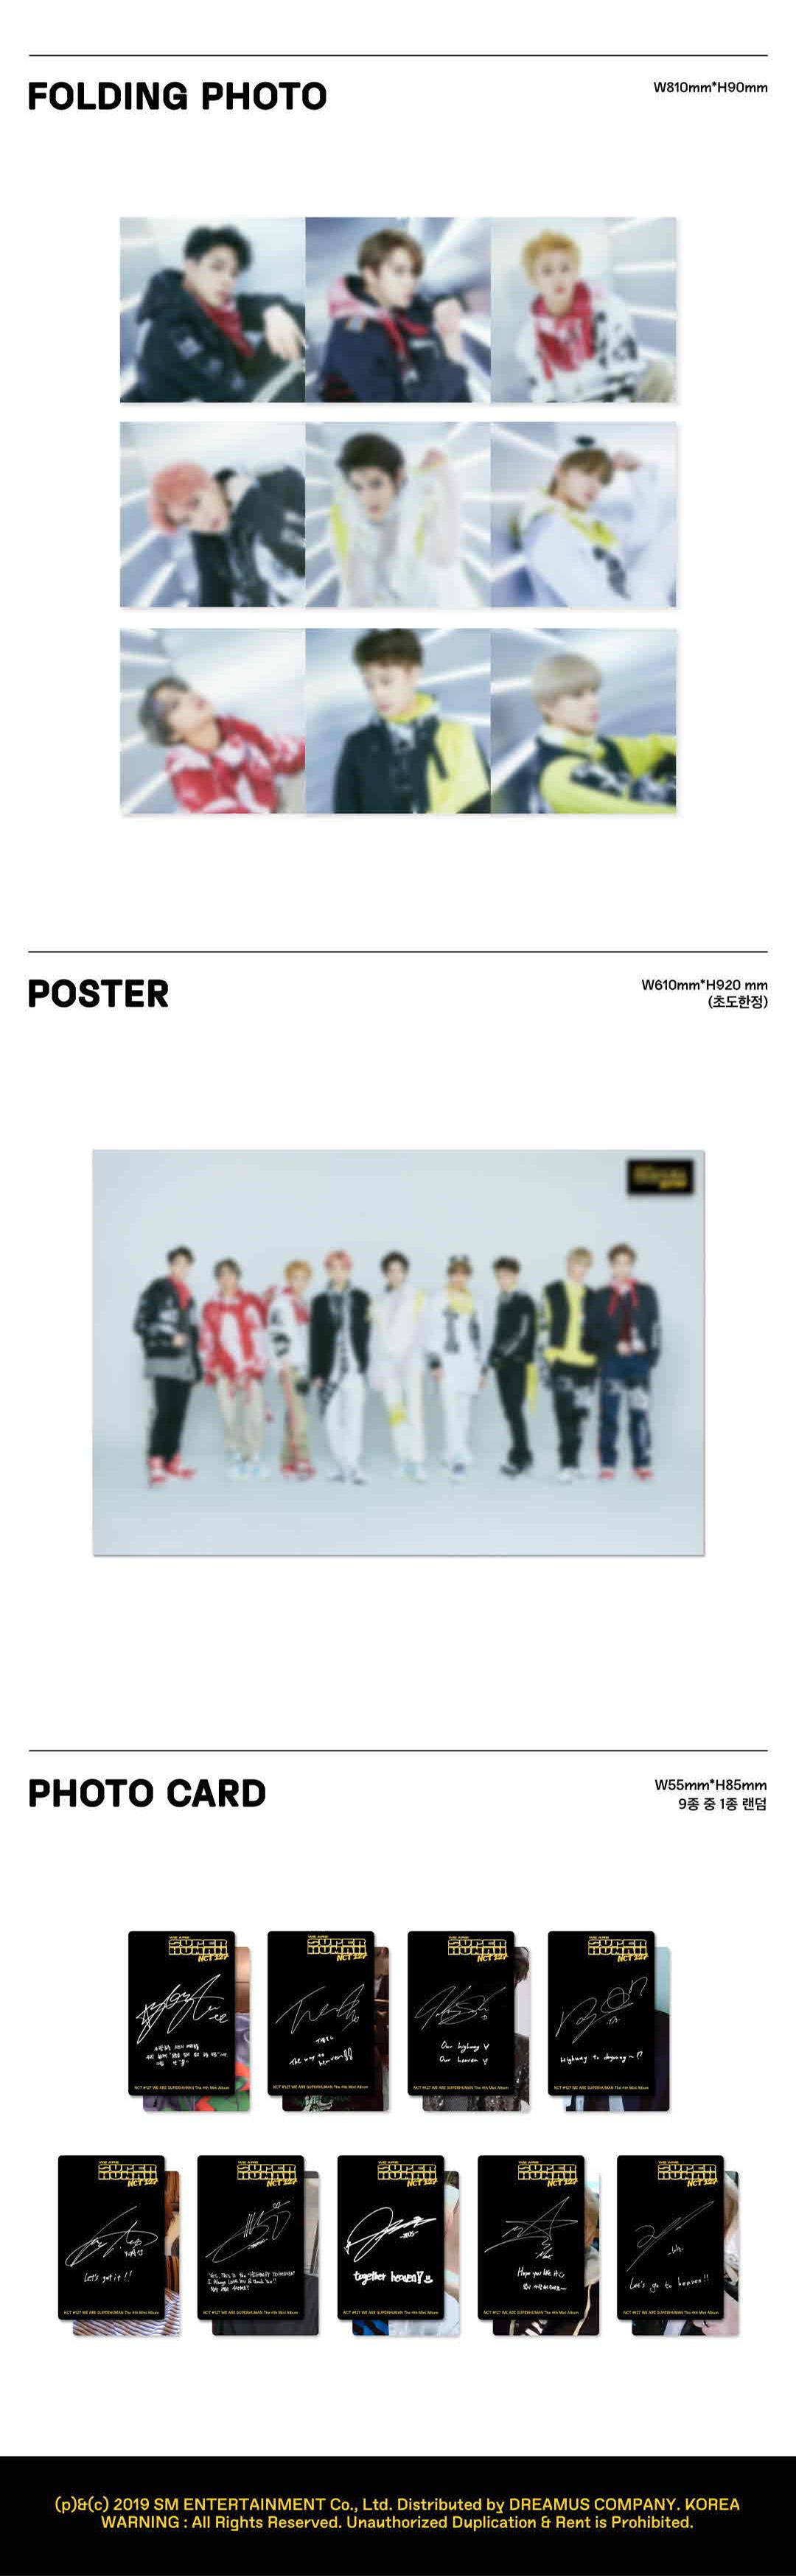 [KIHNO] NCT 127 4th Mini Kihno Album - WE ARE SUPERHUMAN Kihno Kit